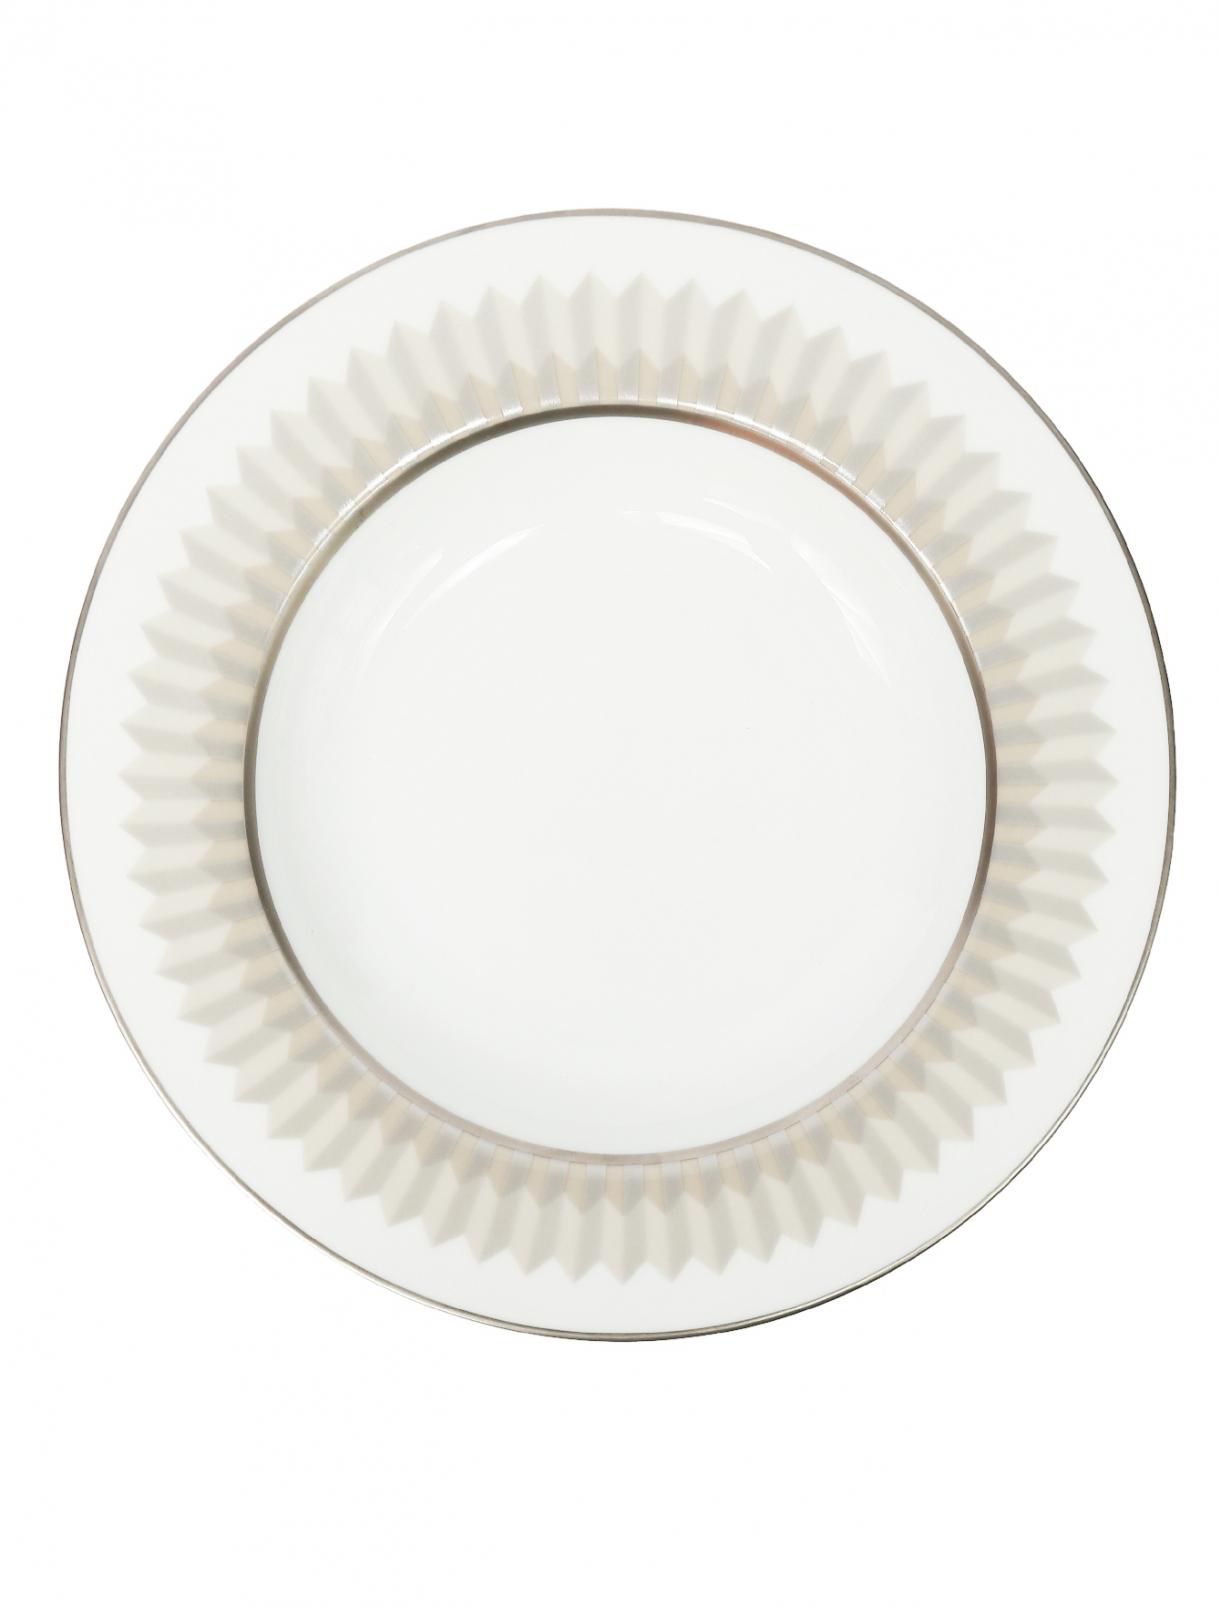 Тарелка суповая из фарфора с геометрическим узором Haviland  –  Общий вид